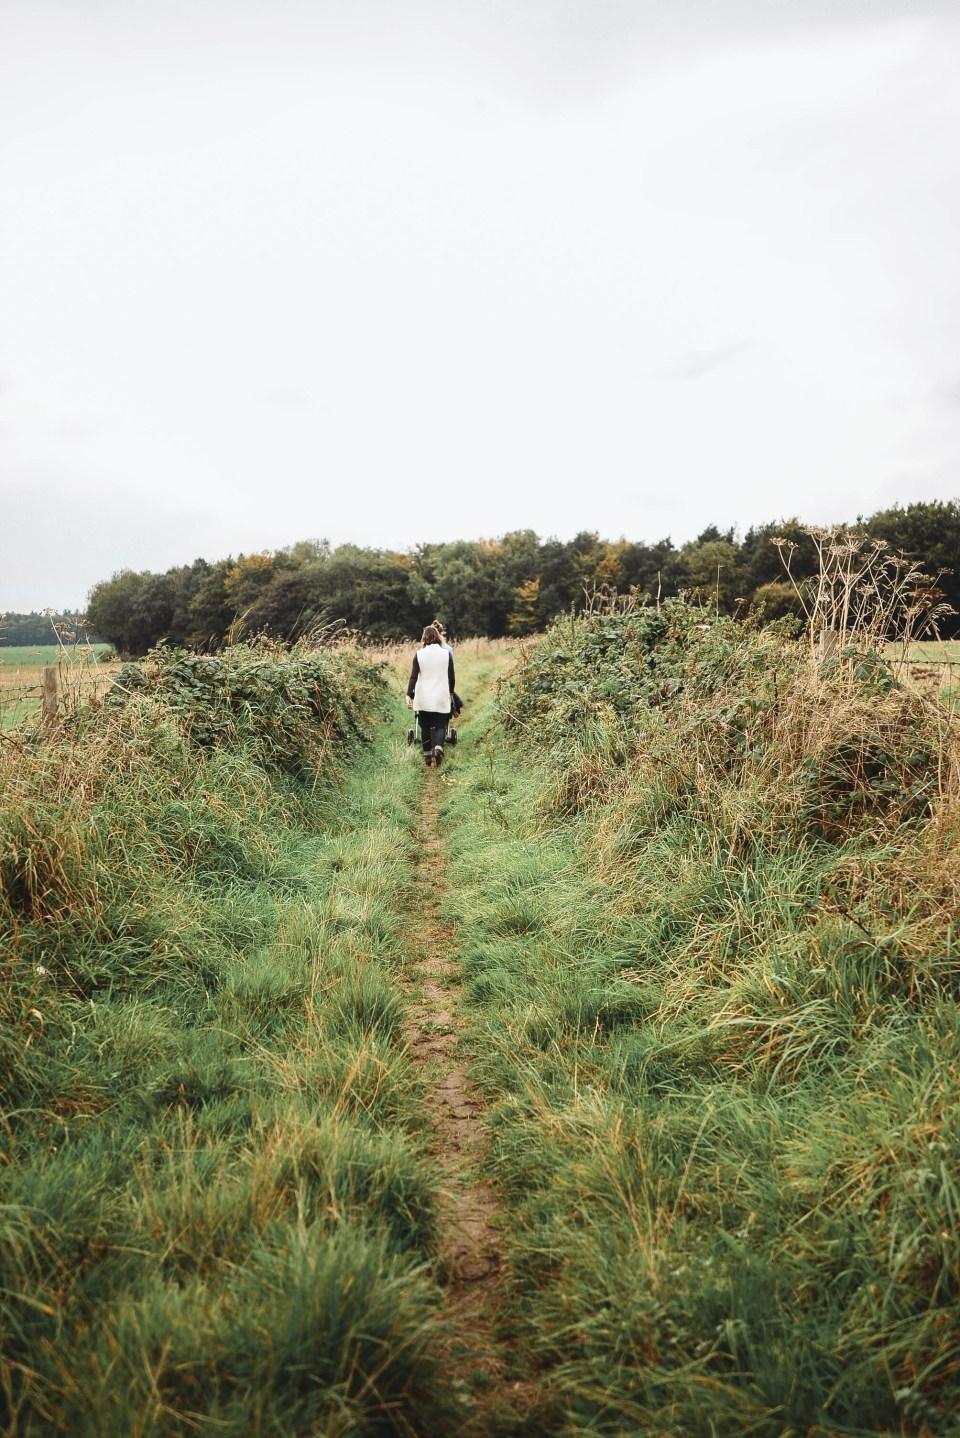 Walk through the English Countryside